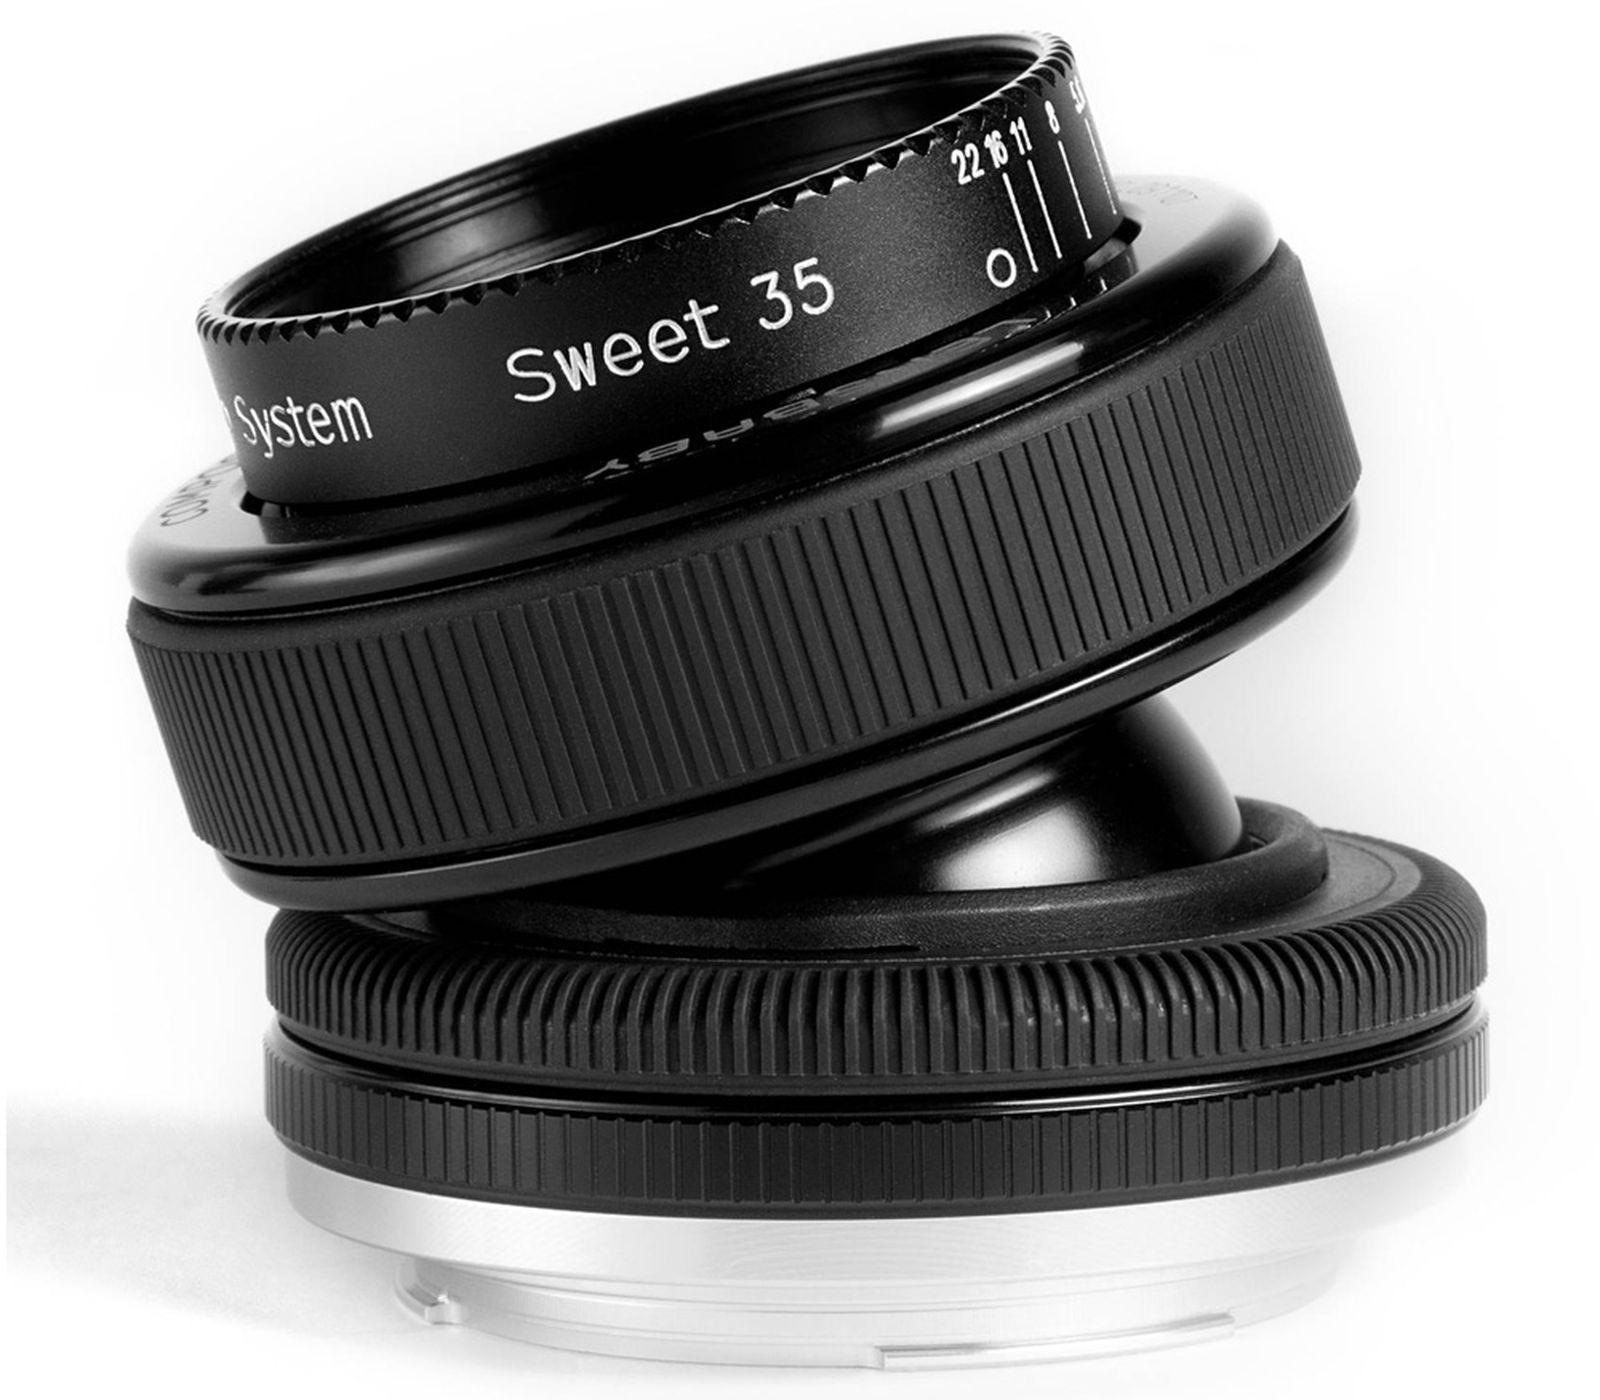 Объектив Lensbaby Composer Pro With Sweet 35 для Micro 4/3, черный